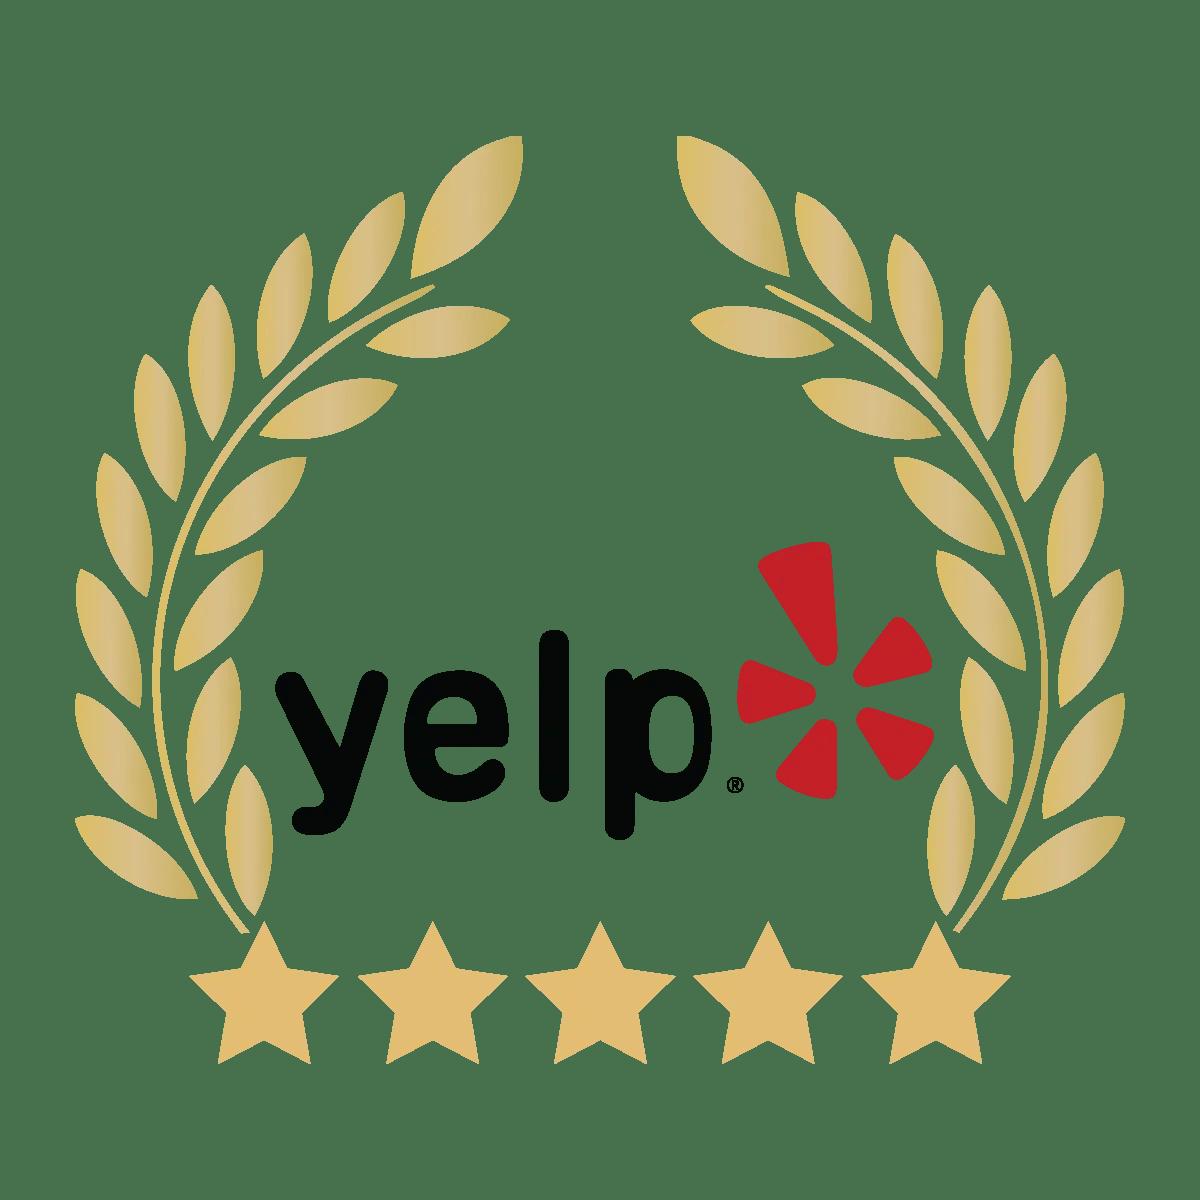 YELP-01